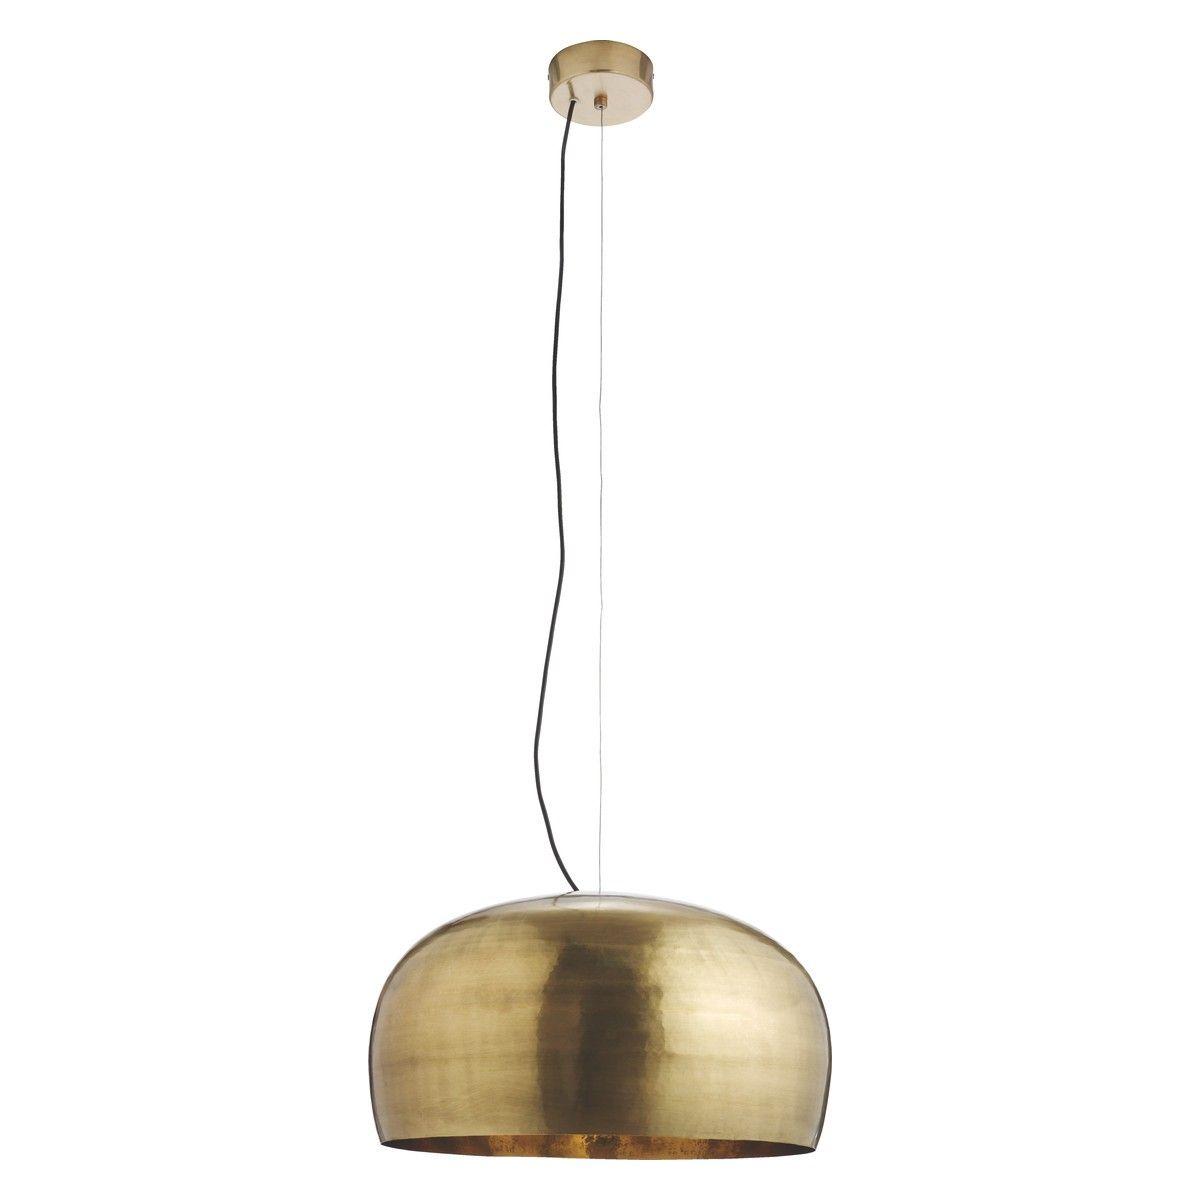 MARTEAU Large Brass Metal Ceiling Light